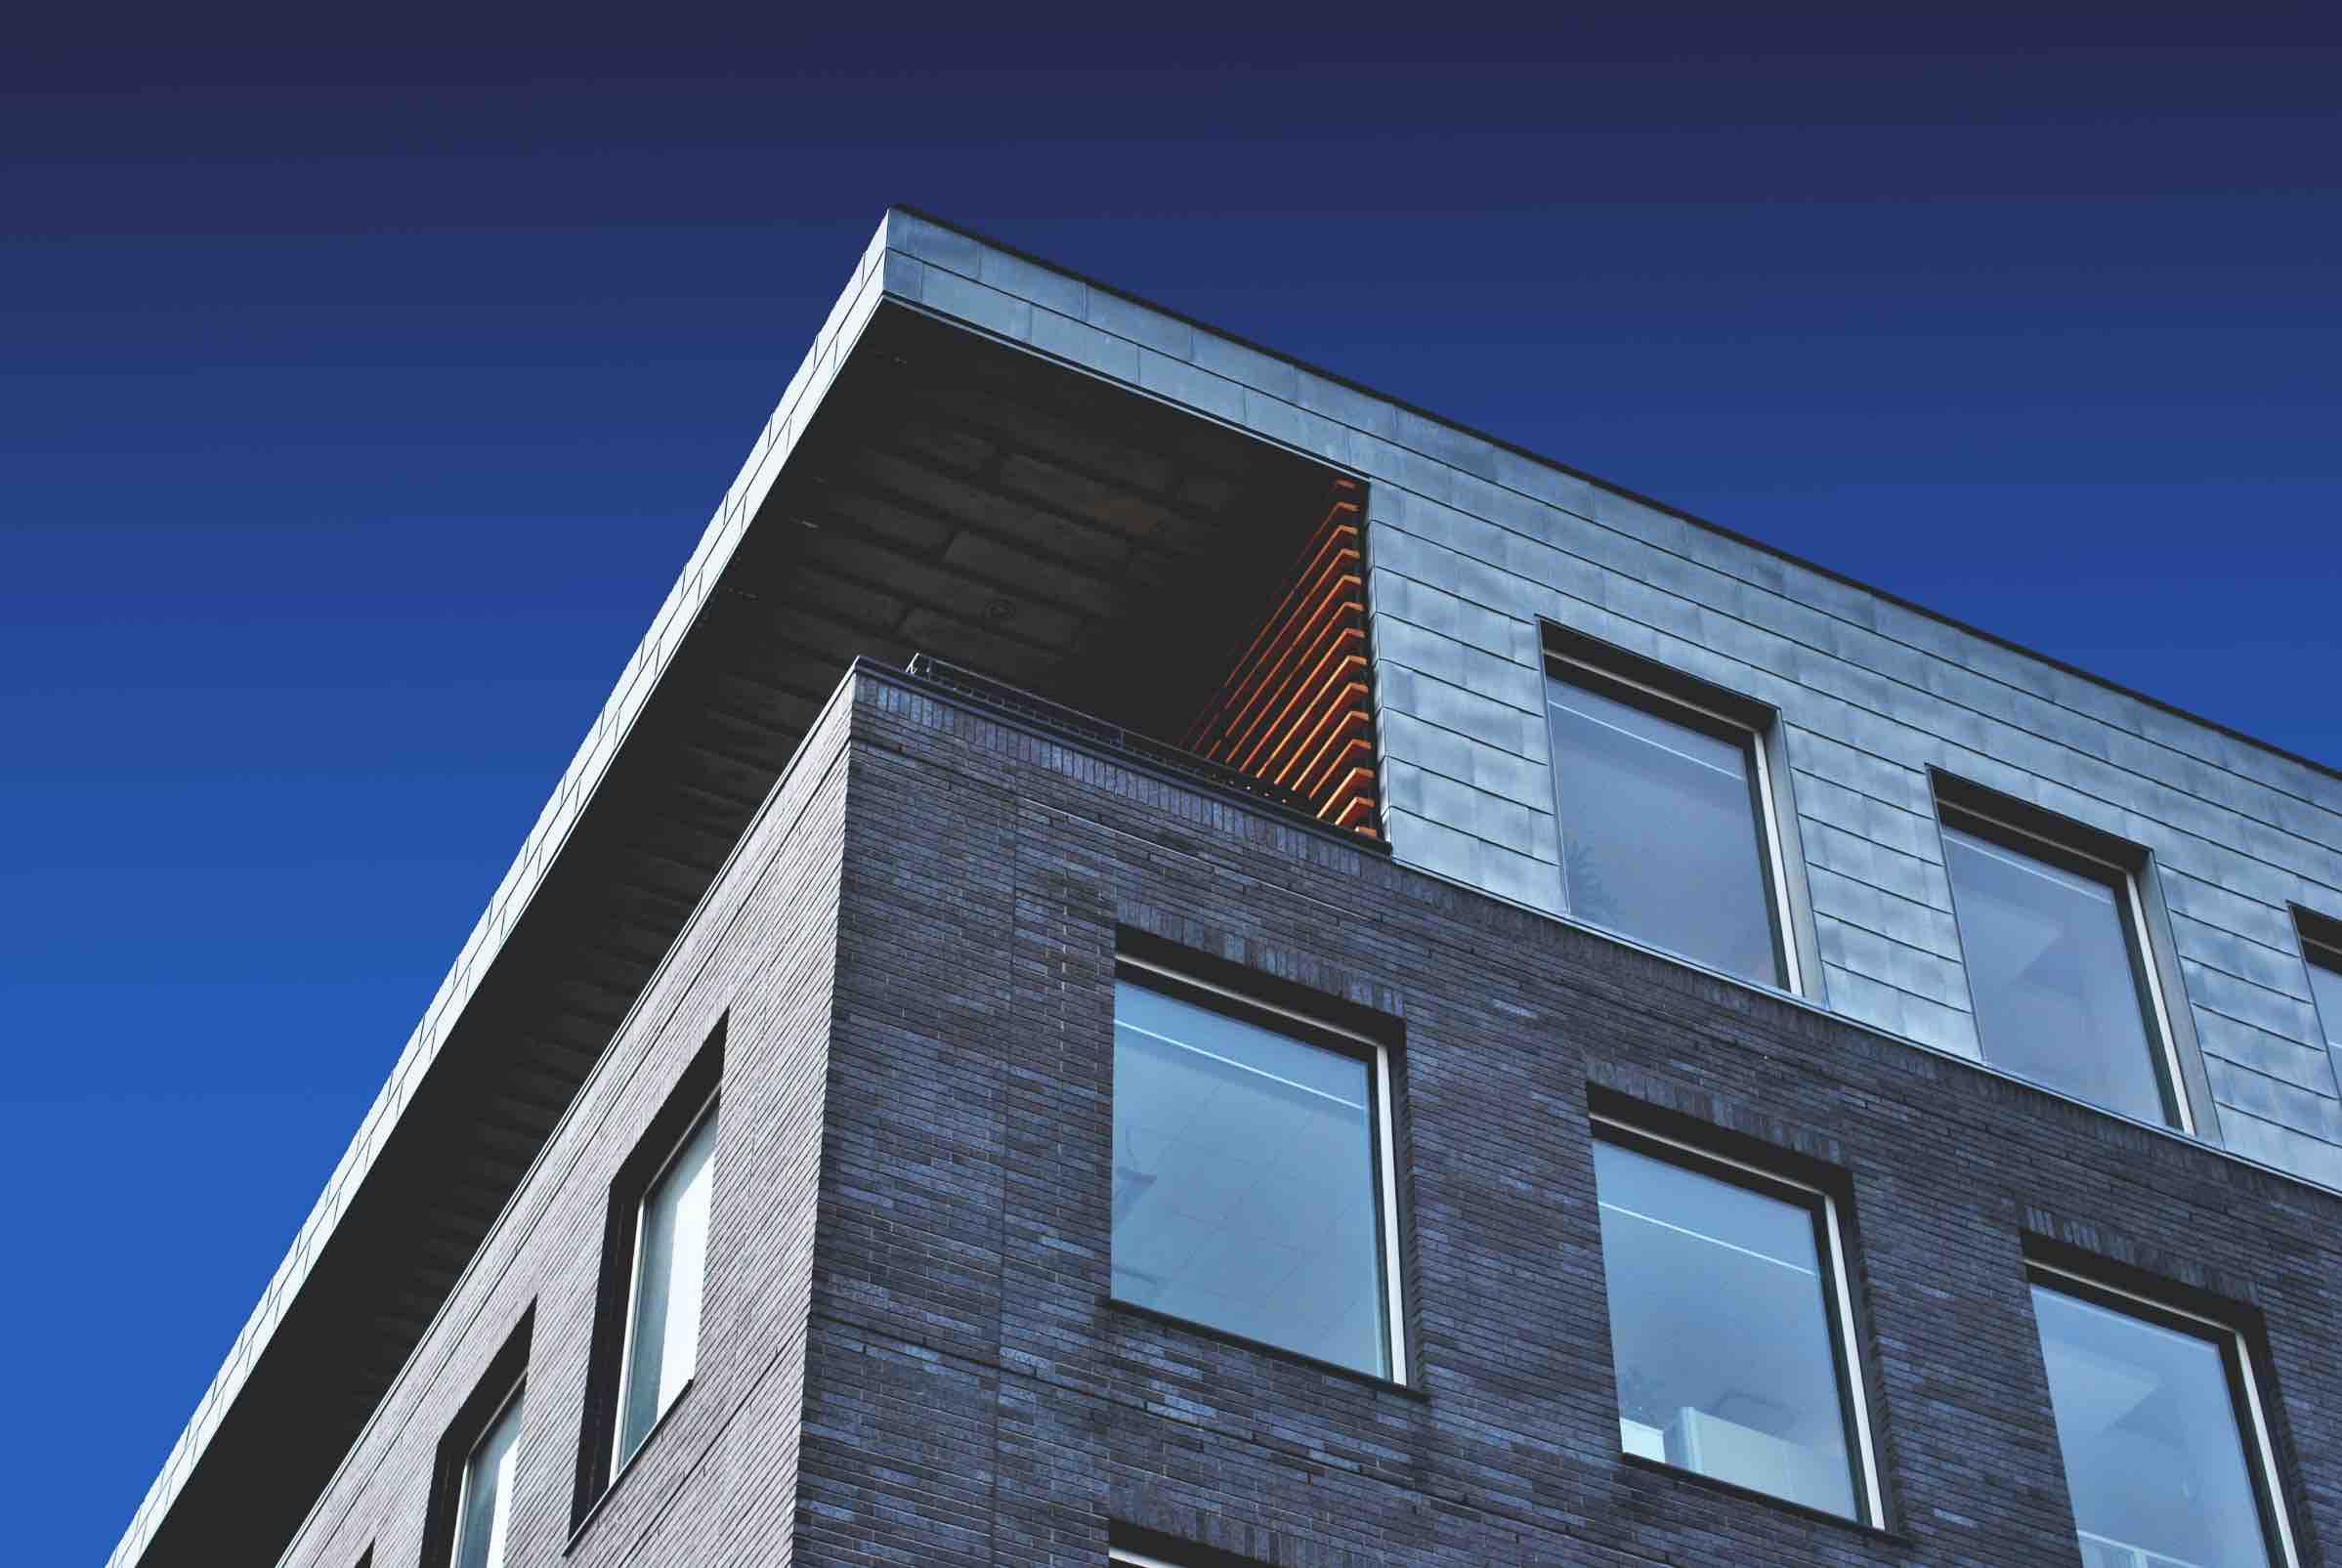 Carbon neutral real estate